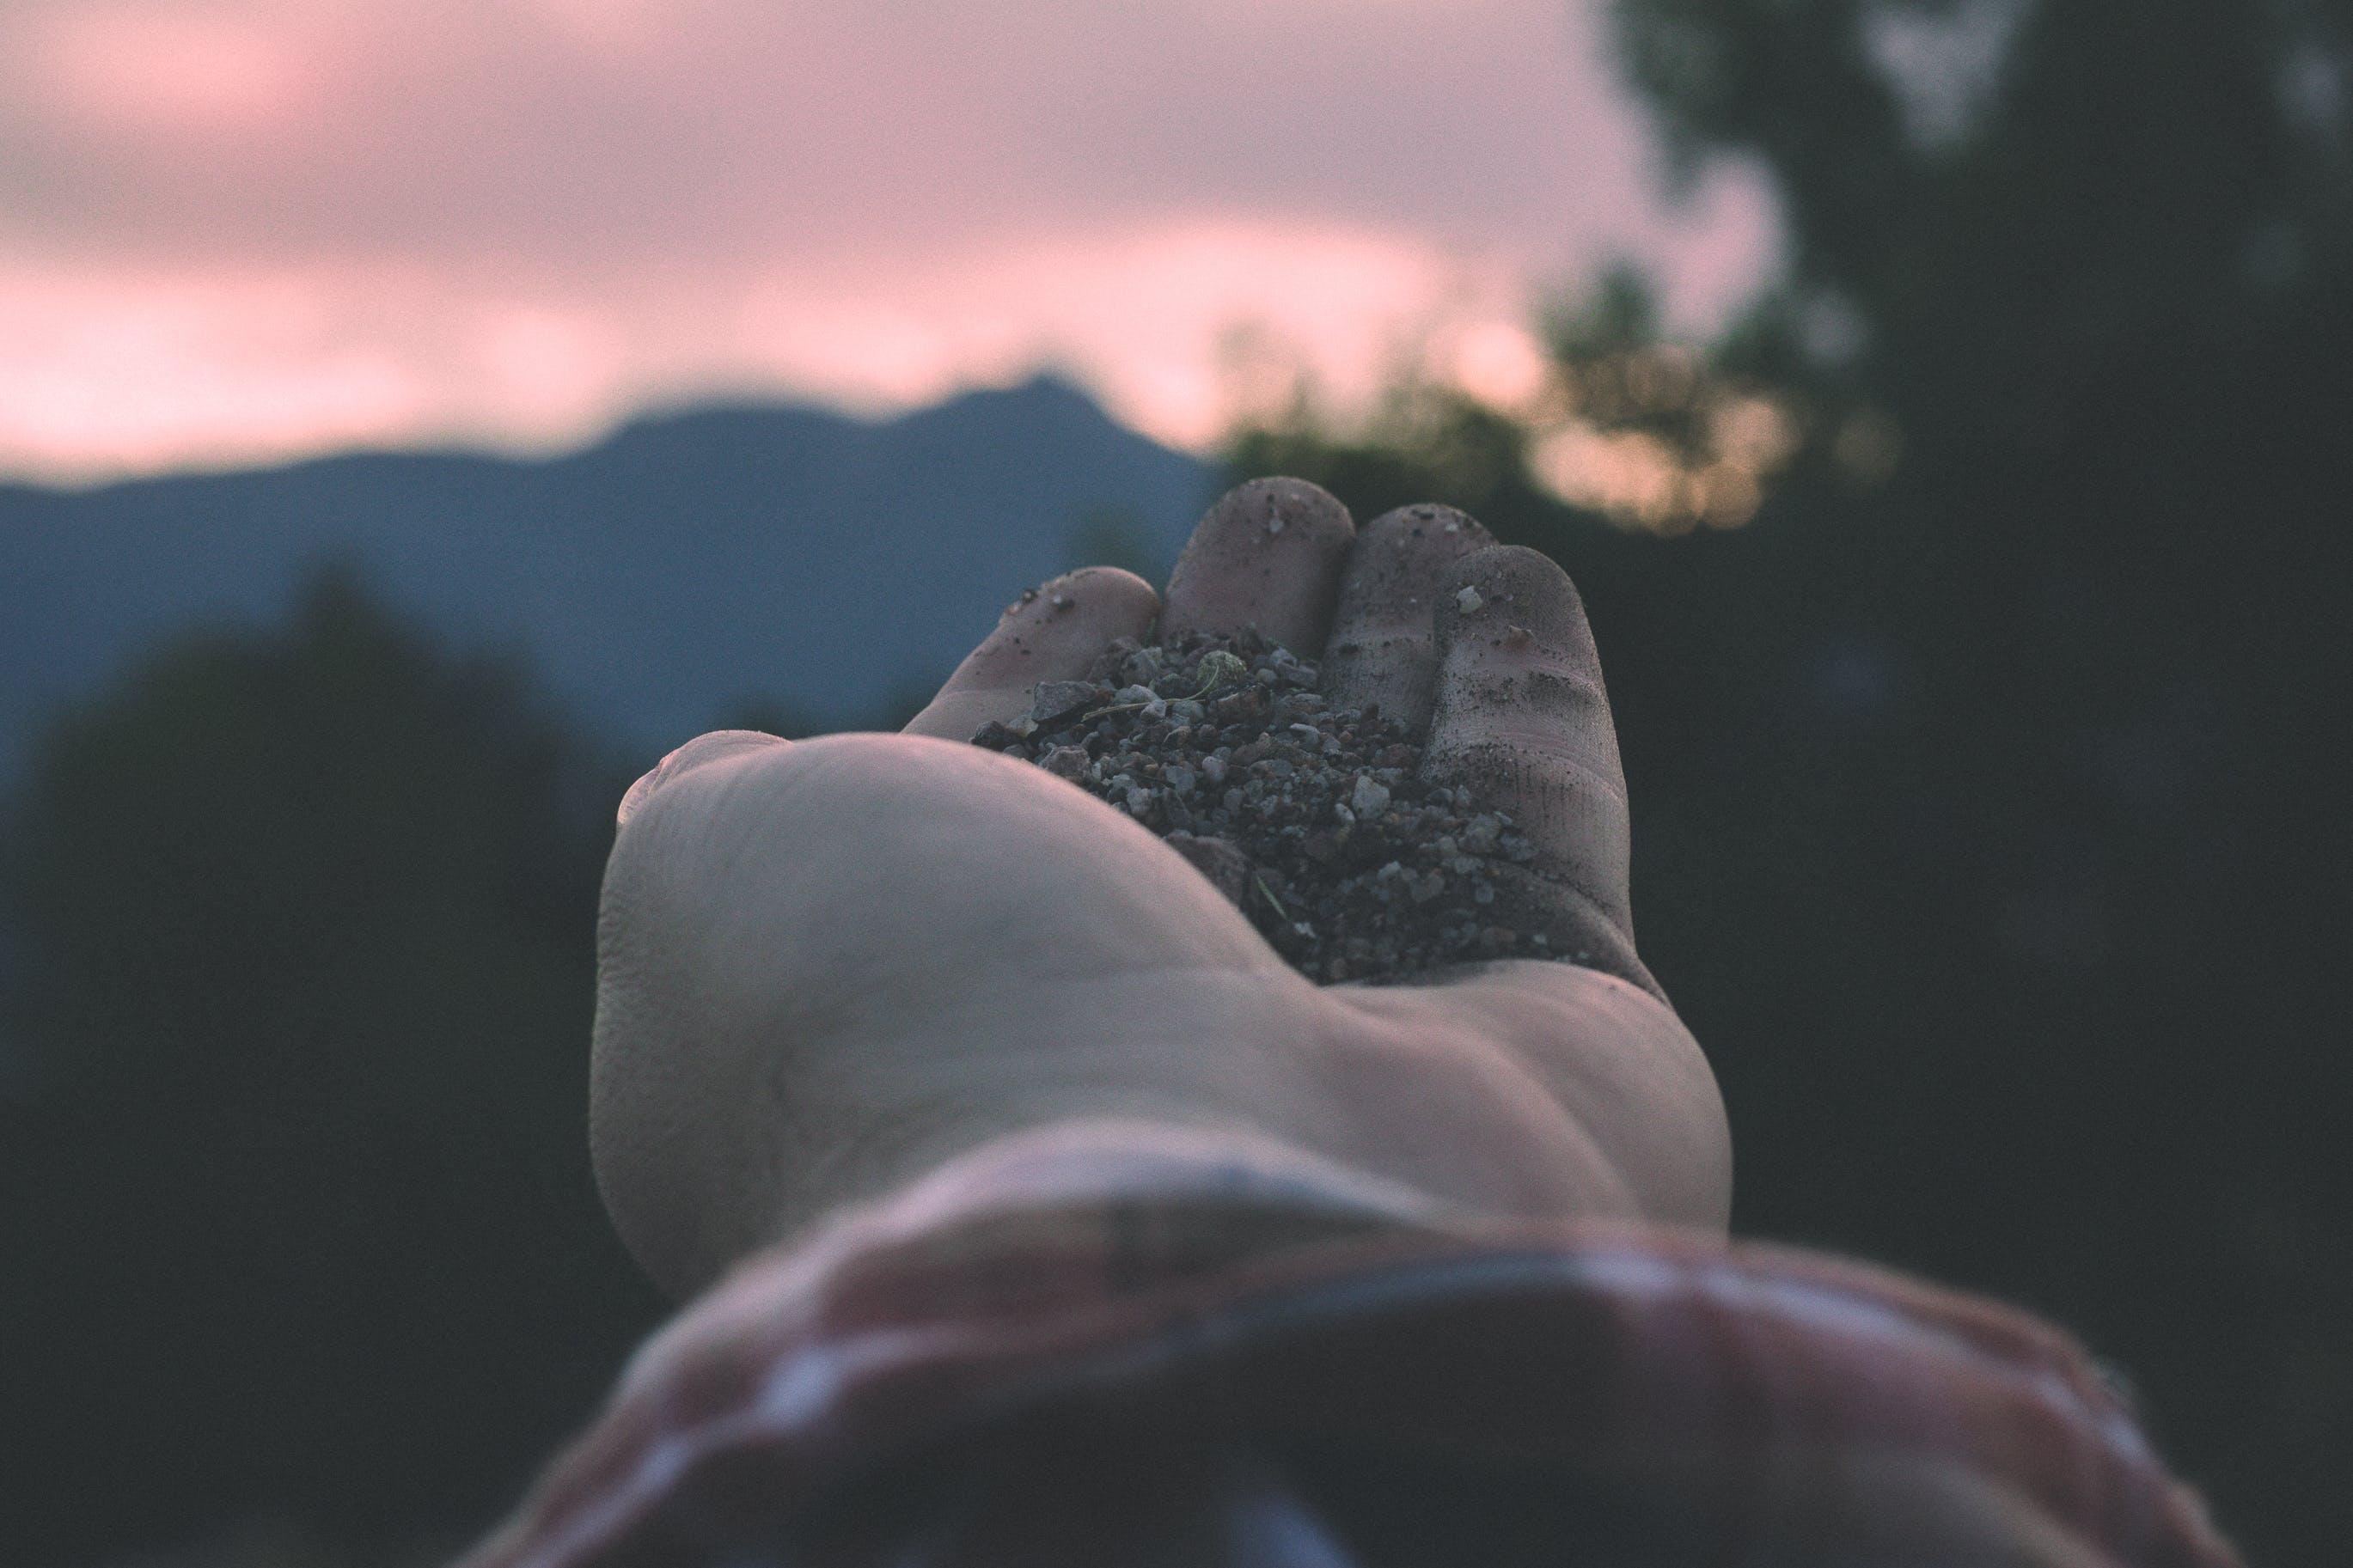 Kostenloses Stock Foto zu berge, felsen, hand, himmel